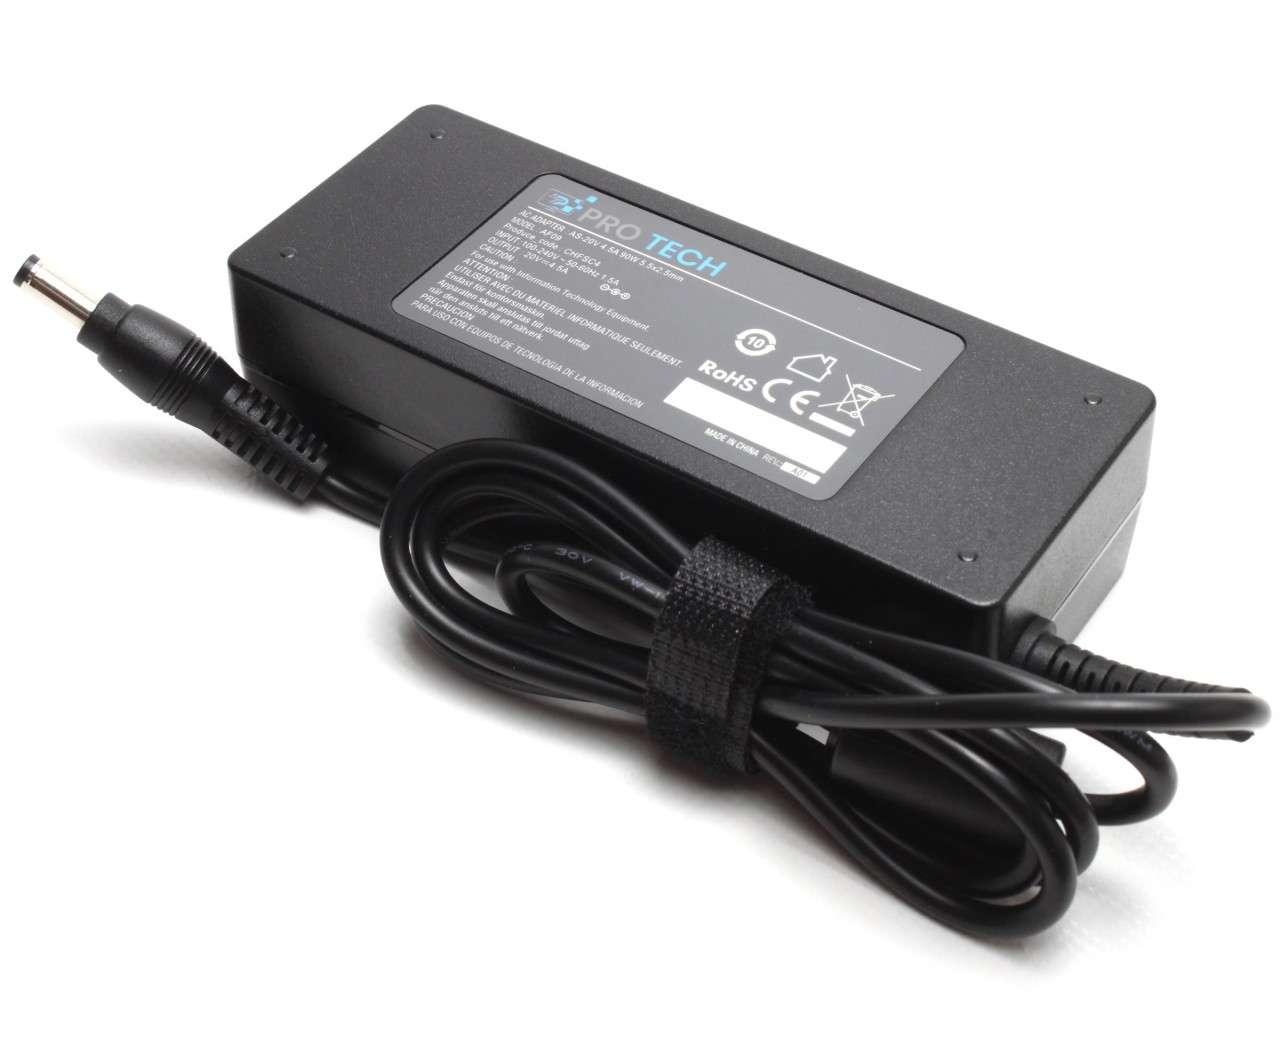 Incarcator Fujitsu Siemens FMV BIBLO NB75G T Replacement imagine powerlaptop.ro 2021